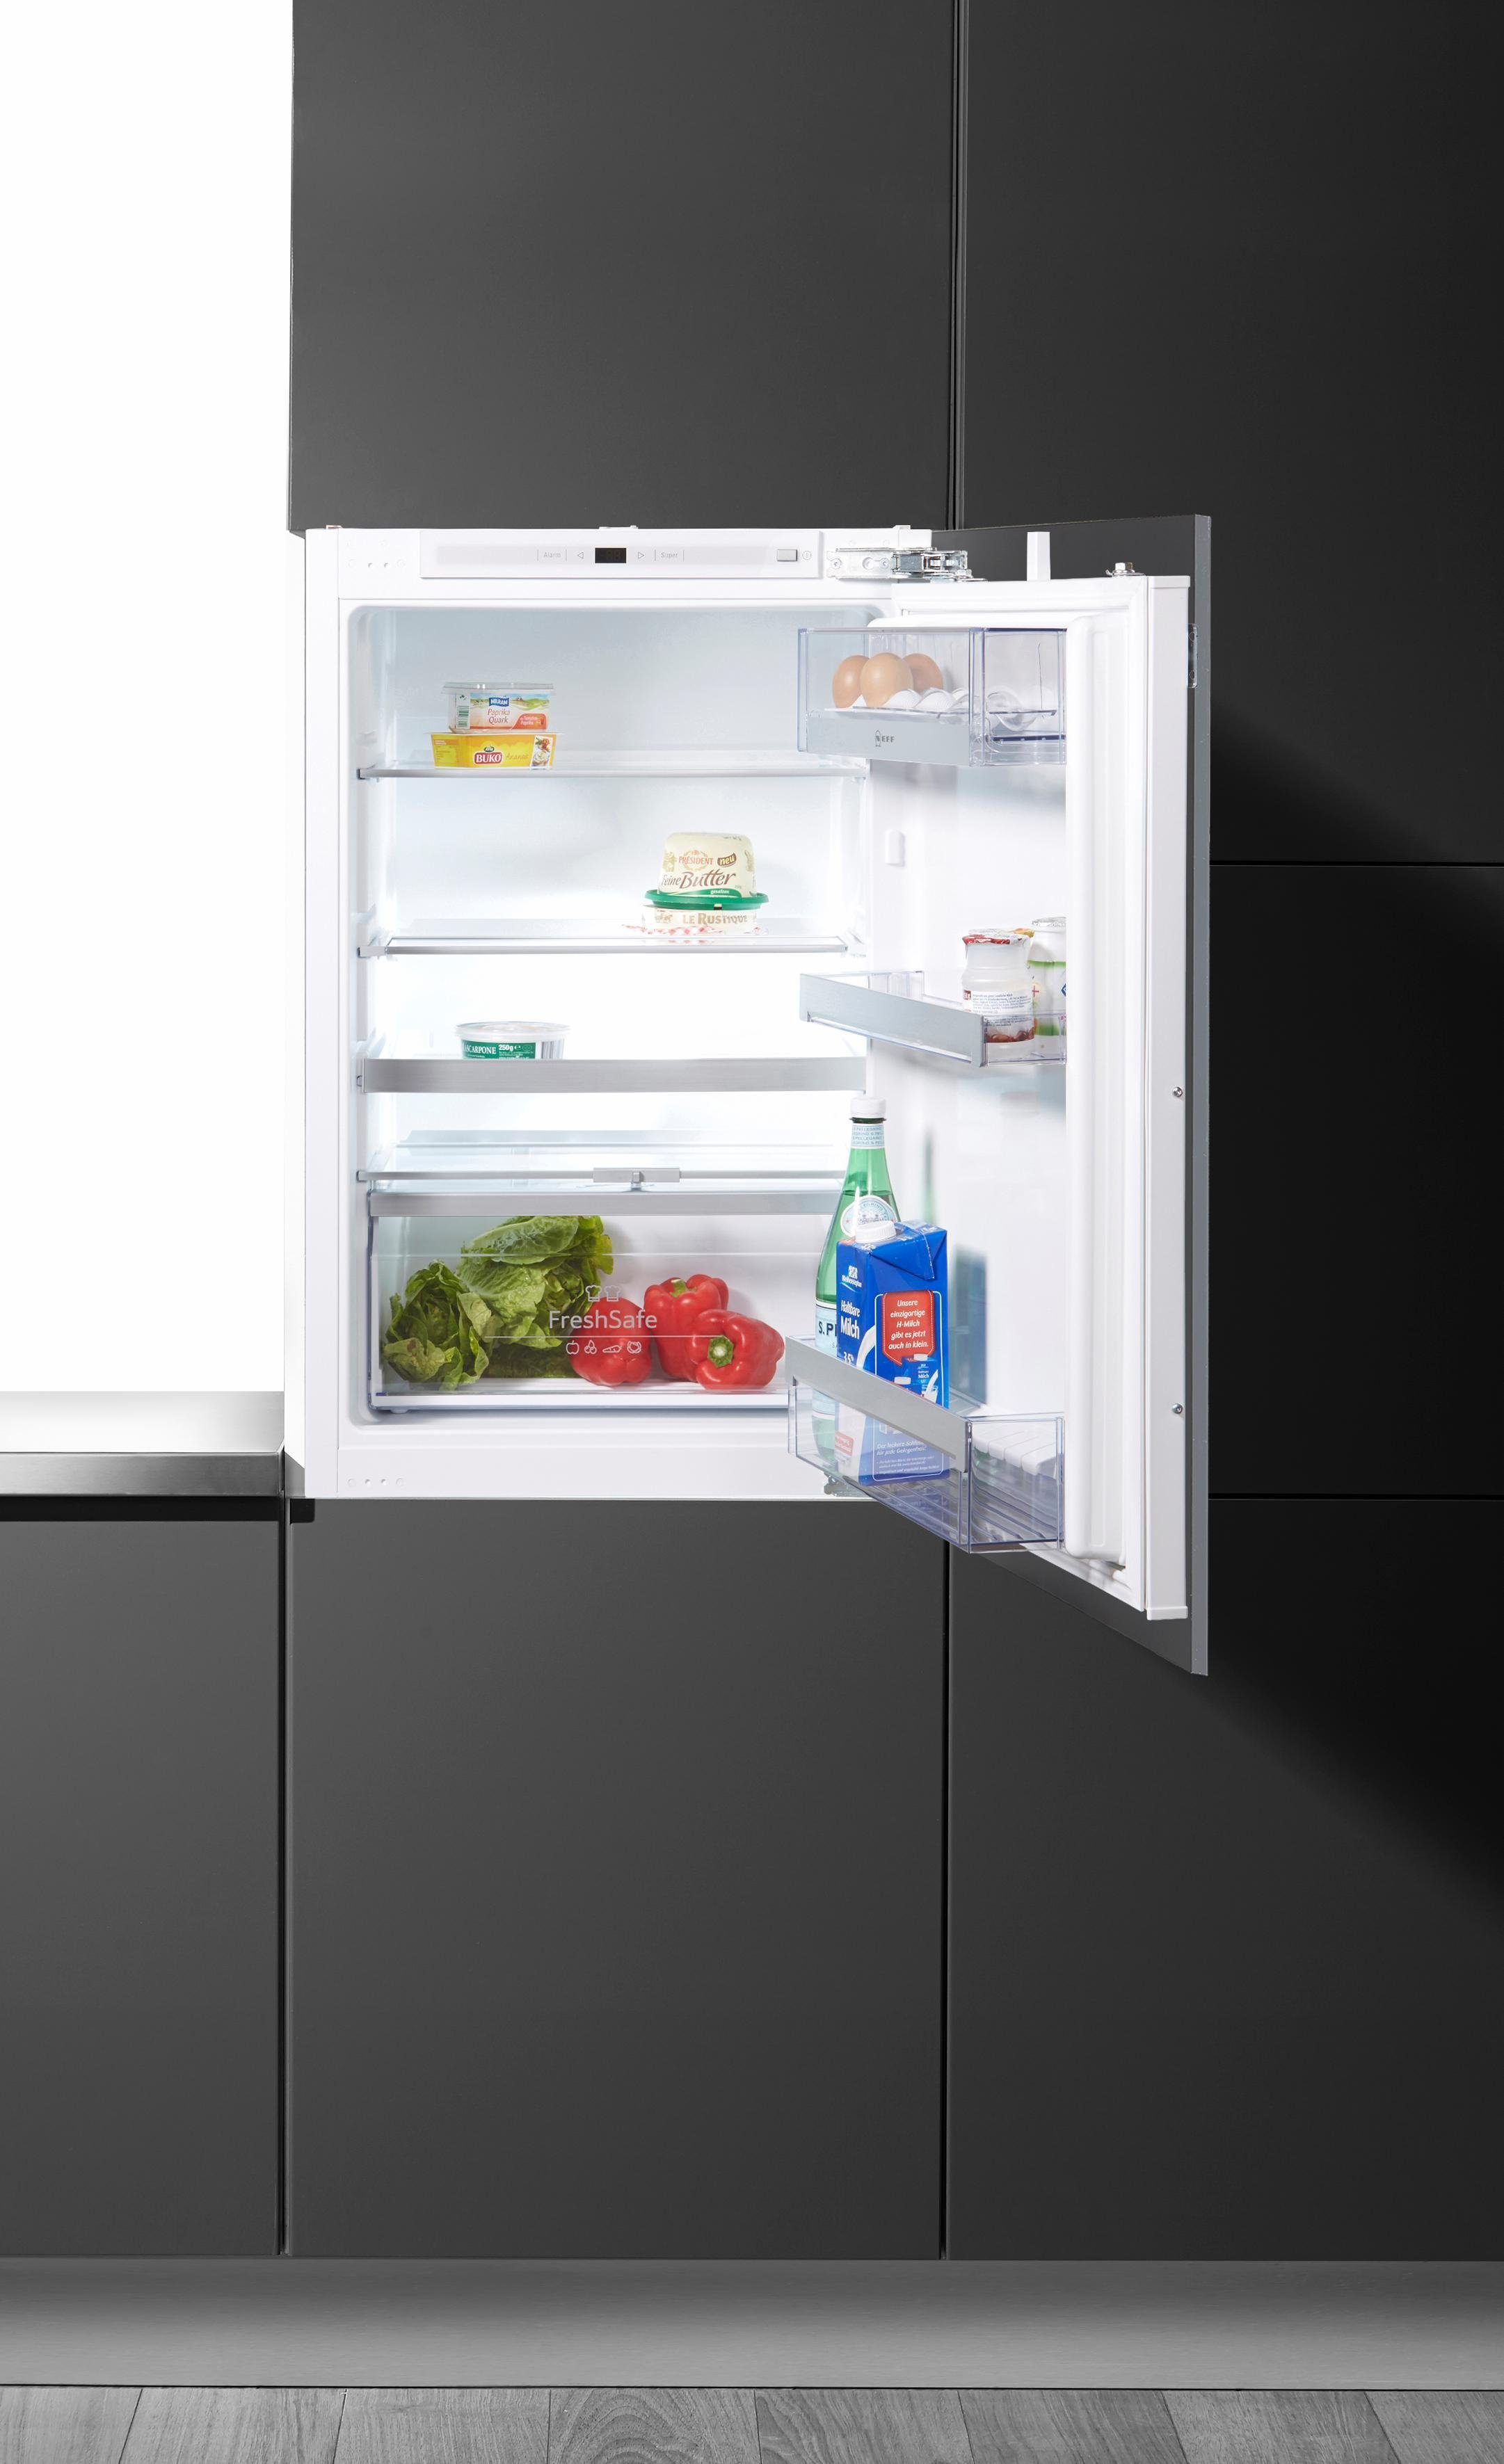 NEFF Einbaukühlschrank K236A3 / KI1213D40, 87,4 cm hoch, 55,8 cm breit, integrierbar